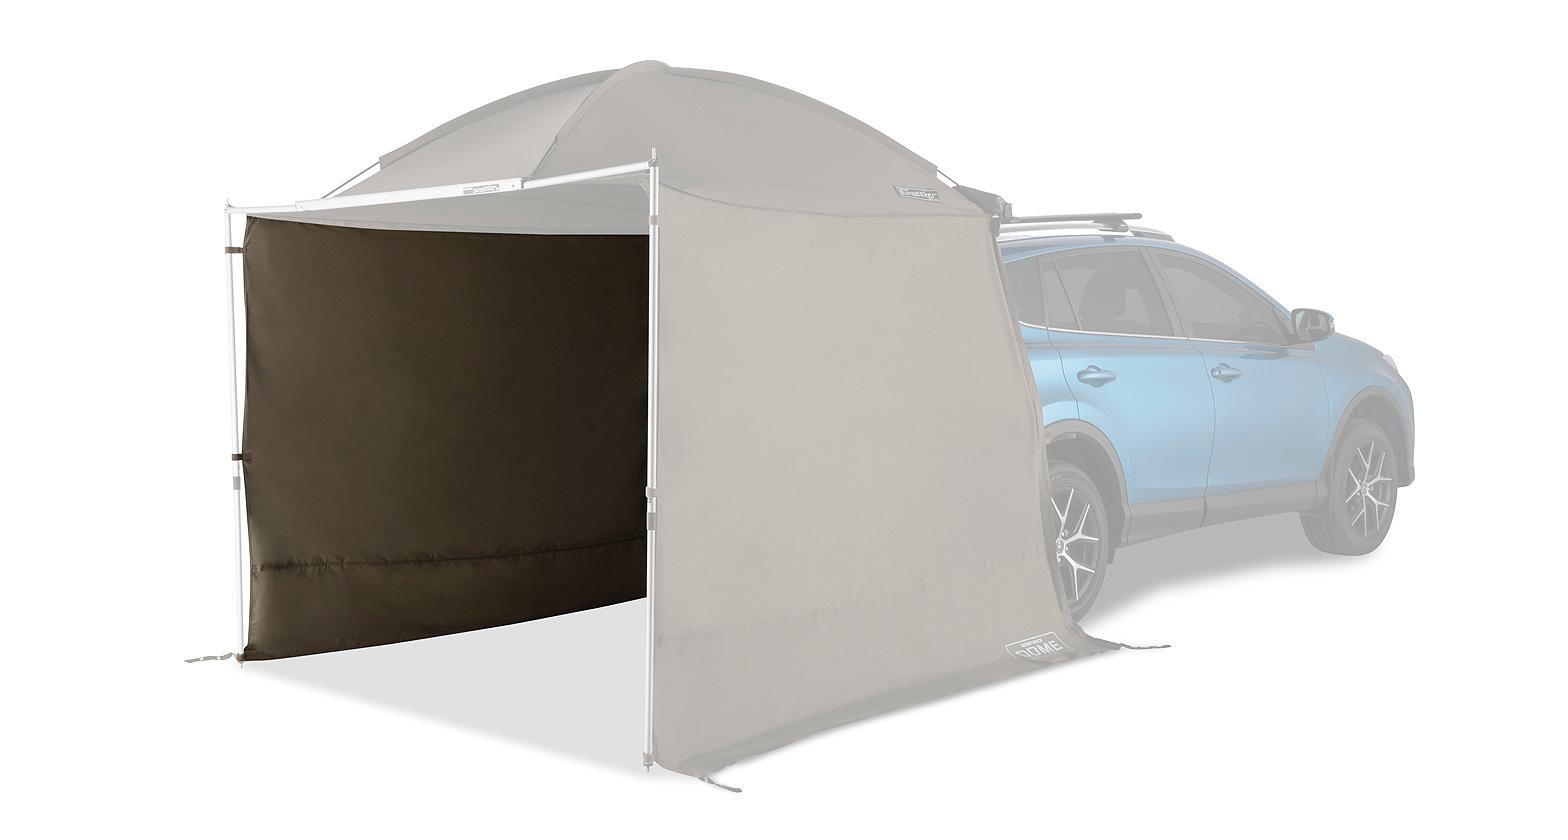 32131 Dome 1300 Side Wall Rhino Rack